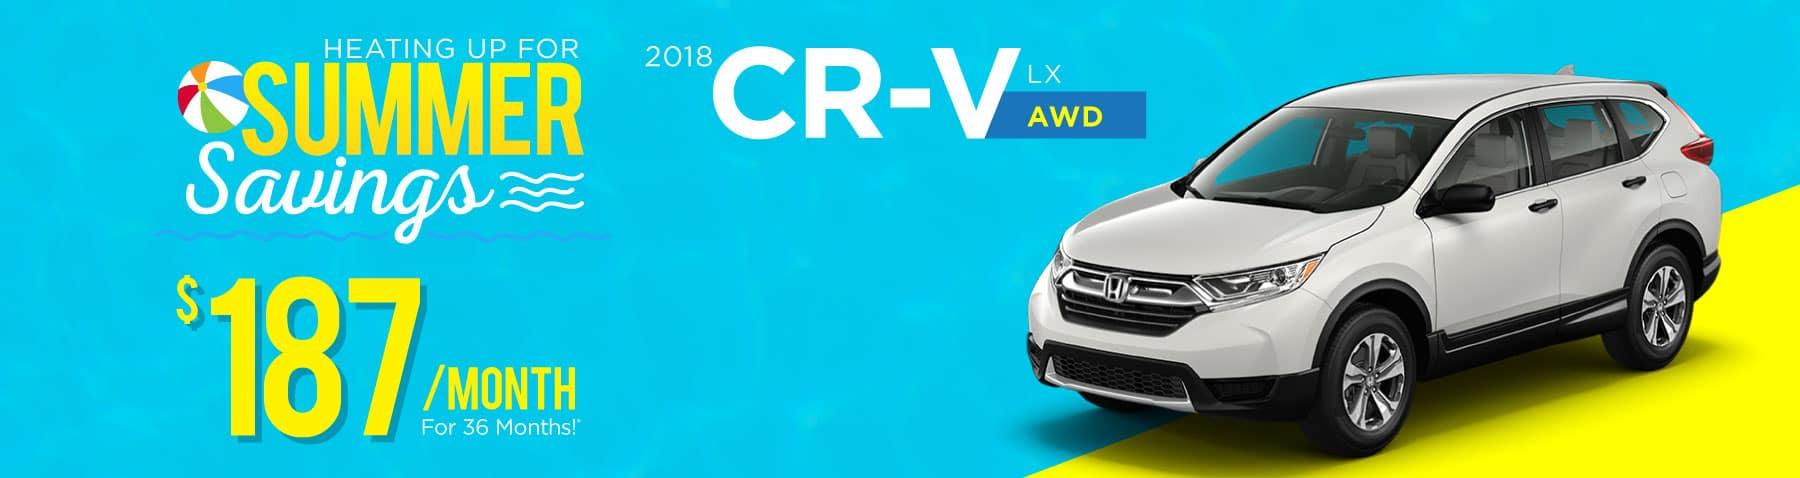 Header Photo of the new 2018 Honda CR-V